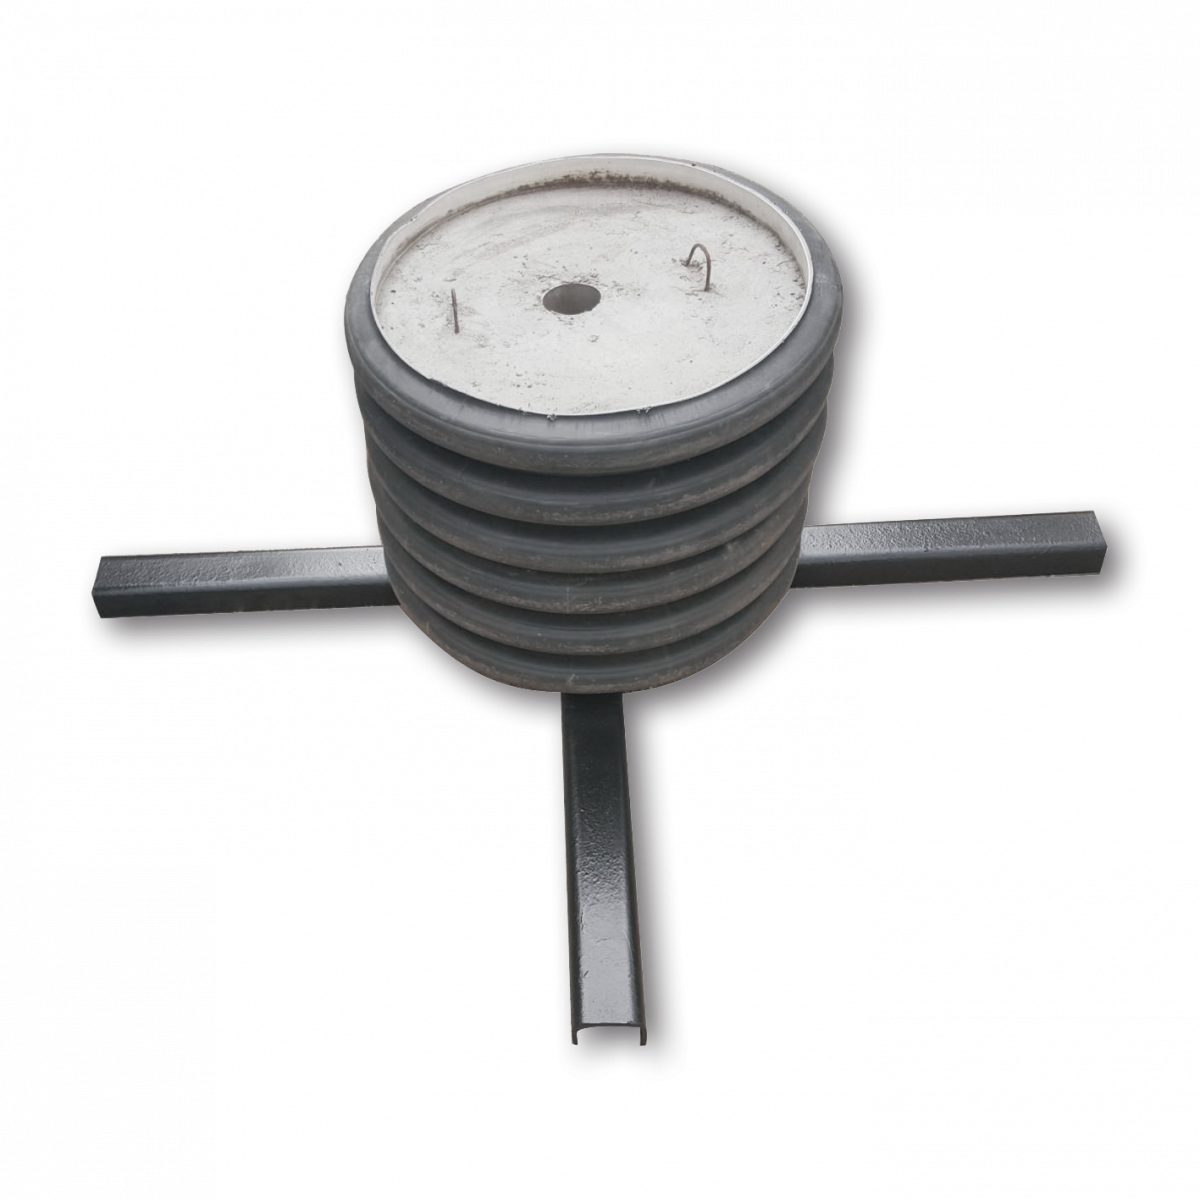 Основание знака железобетонное, диаметр стойки 76 мм